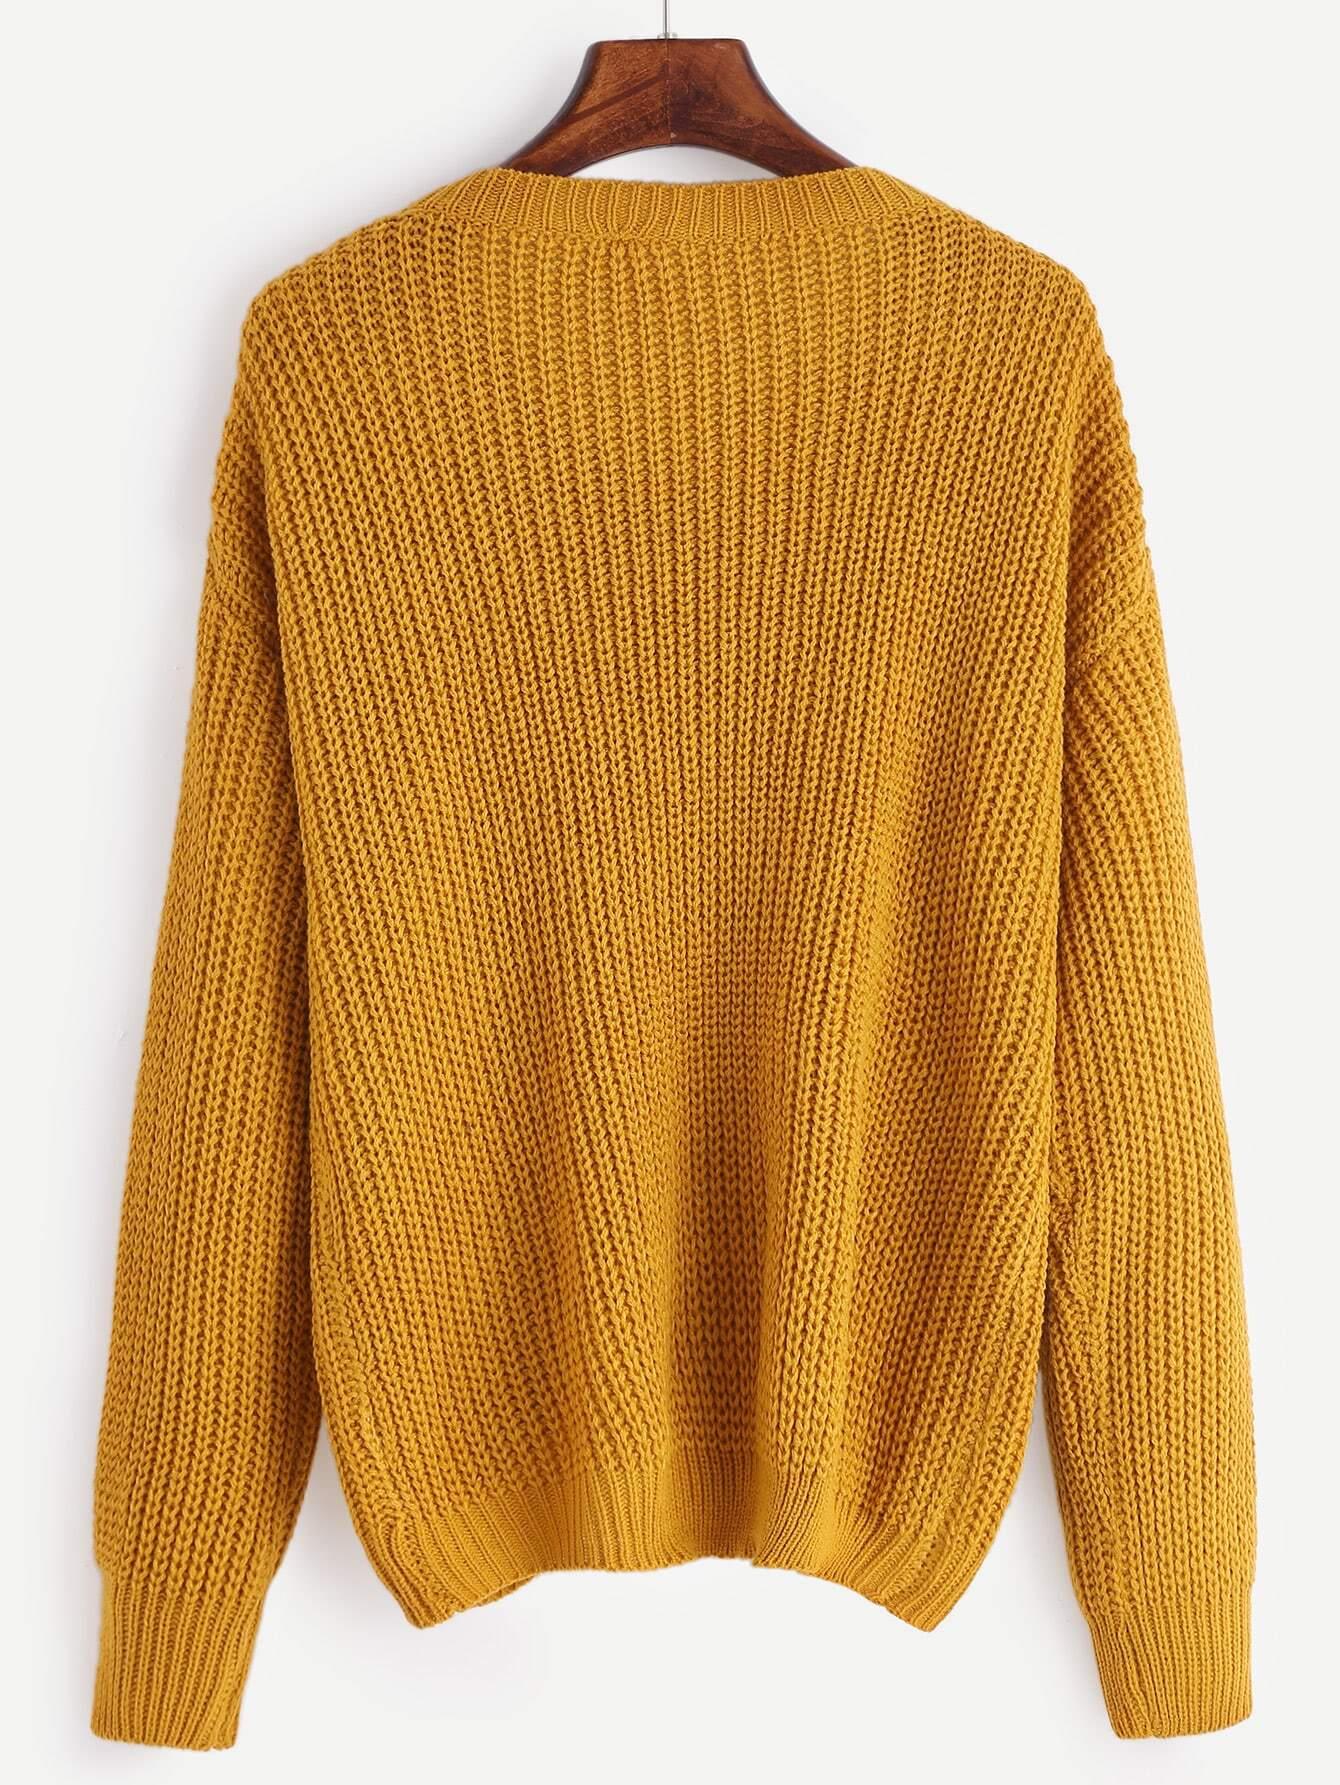 sweater161101405_2